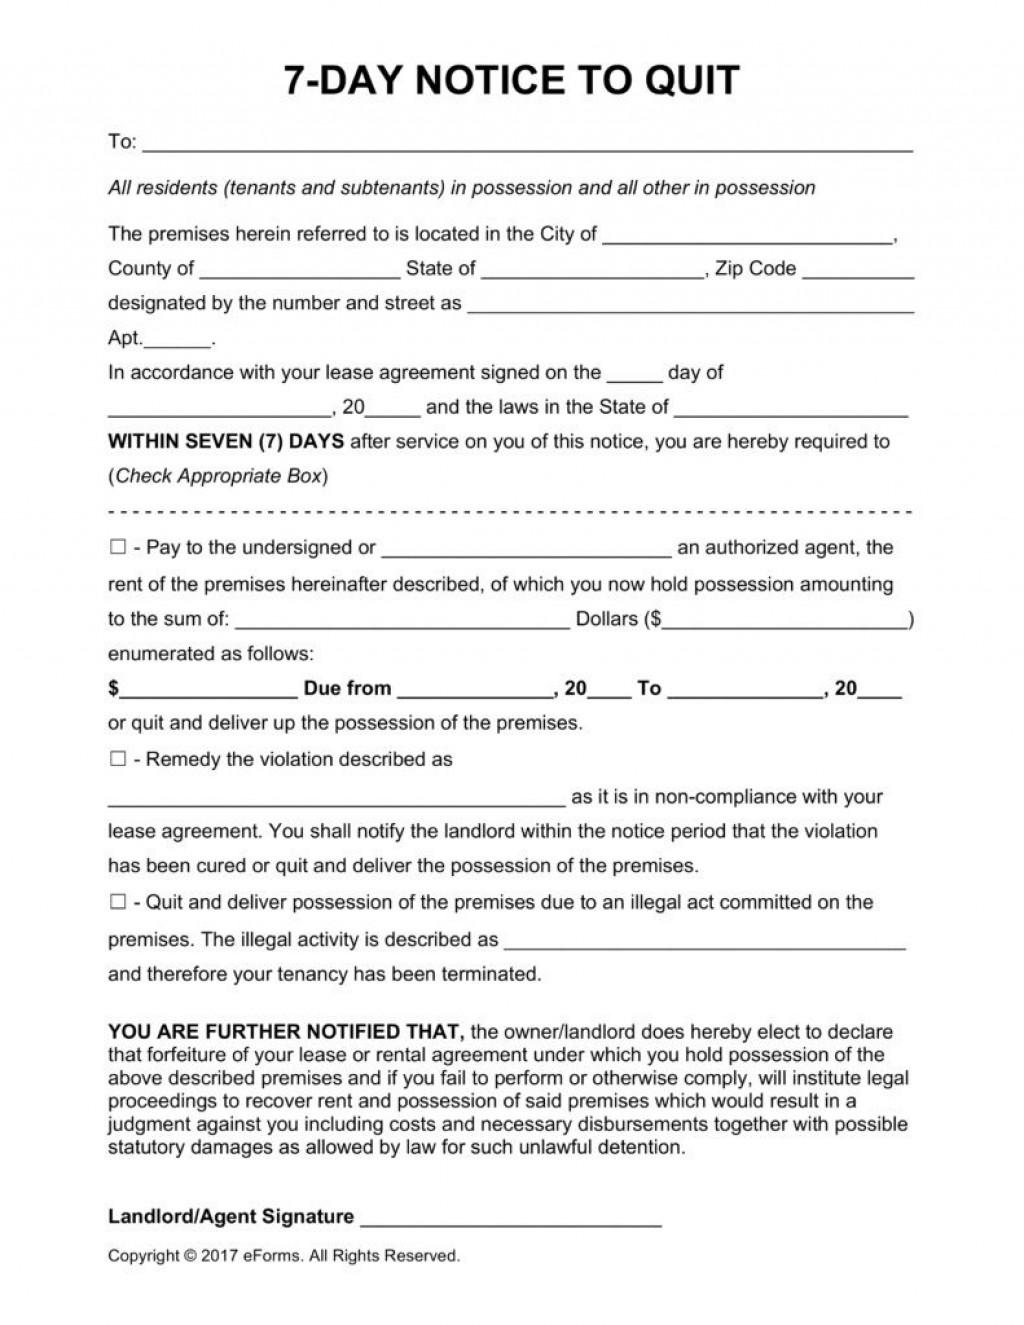 003 Surprising Eviction Notice Florida Template Image  15 Day Free PrintableLarge